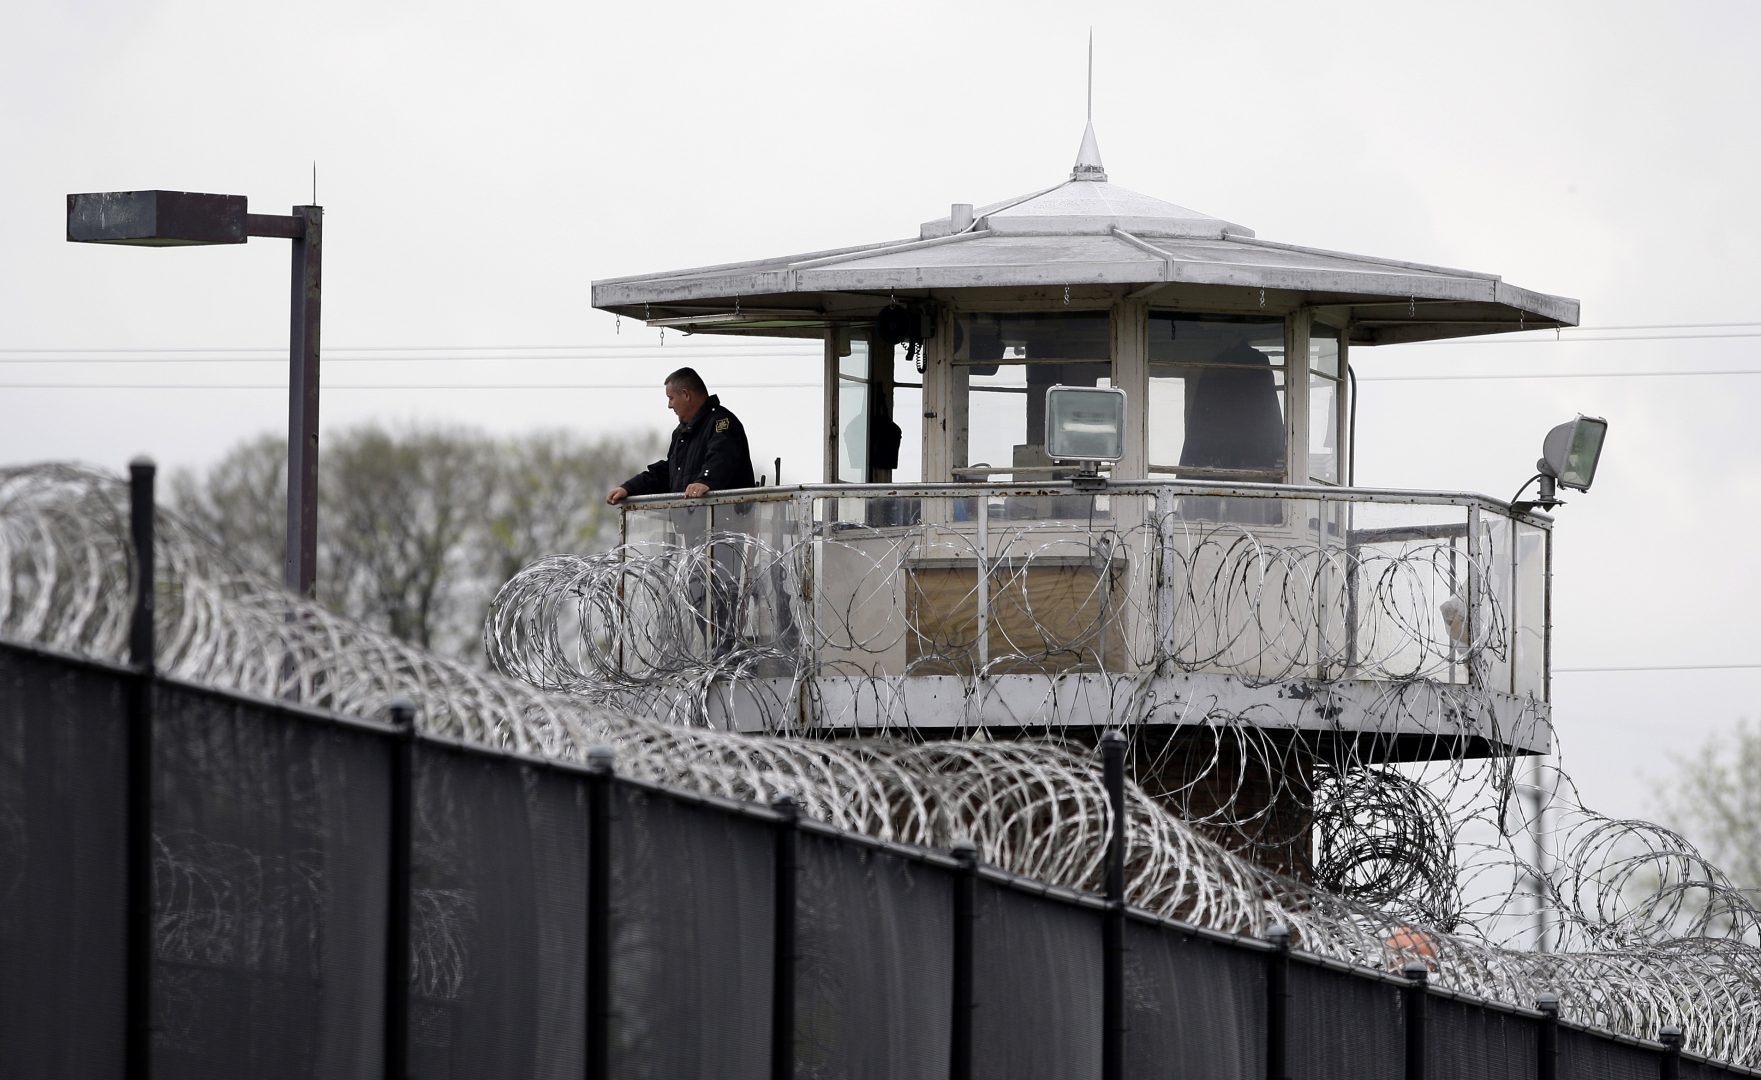 Pennsylvania board of probation and parole – USA Breaking News